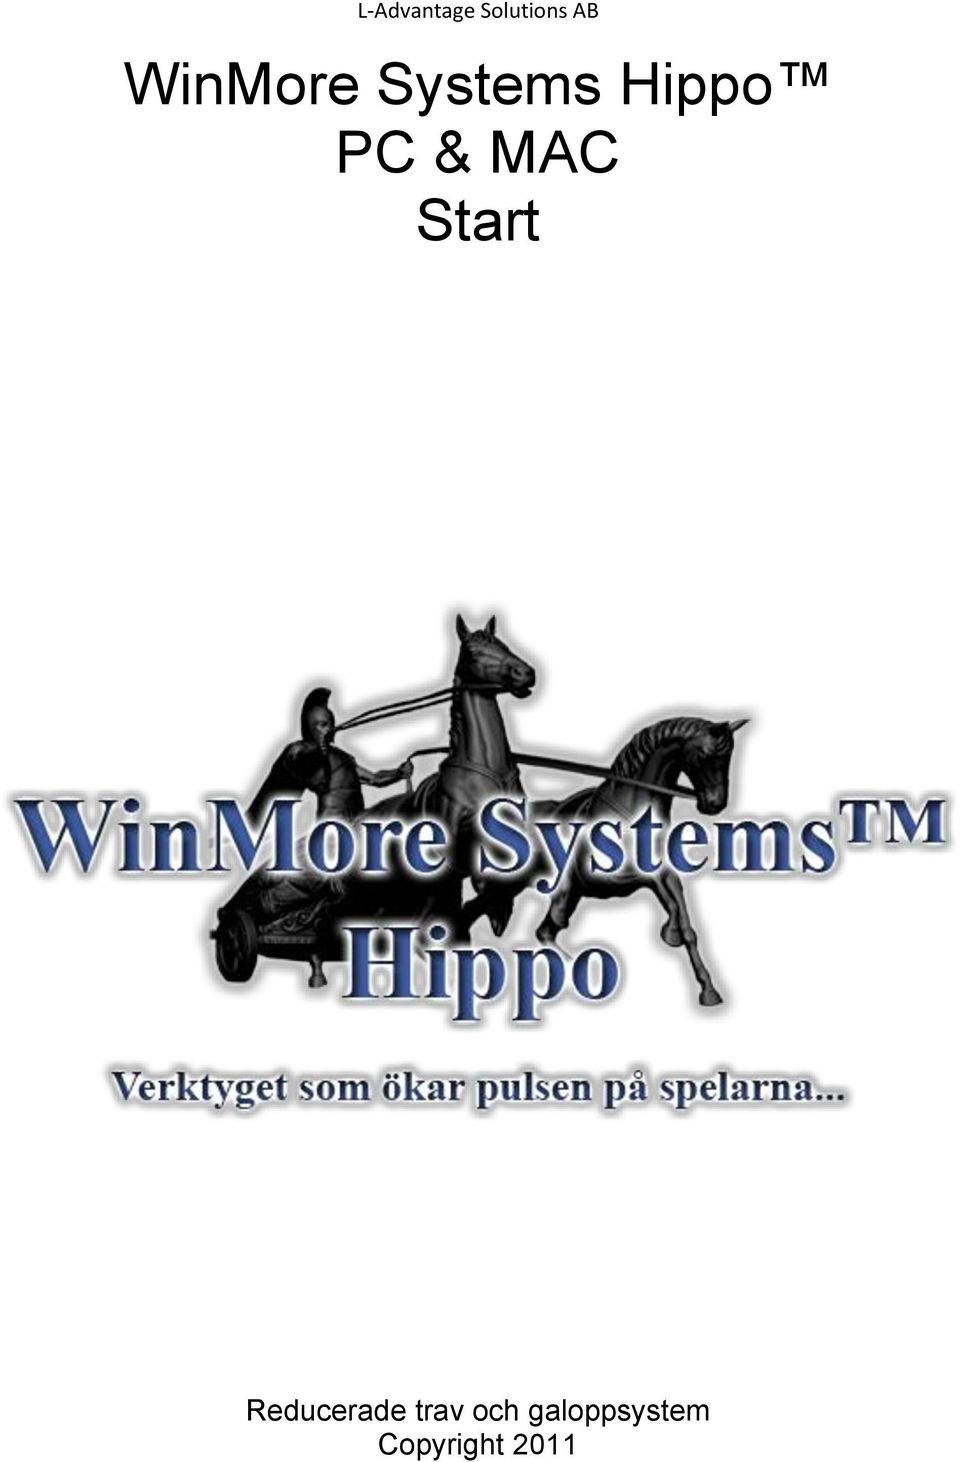 L-Advantage Solutions AB. WinMore Systems Hippo PC & MAC